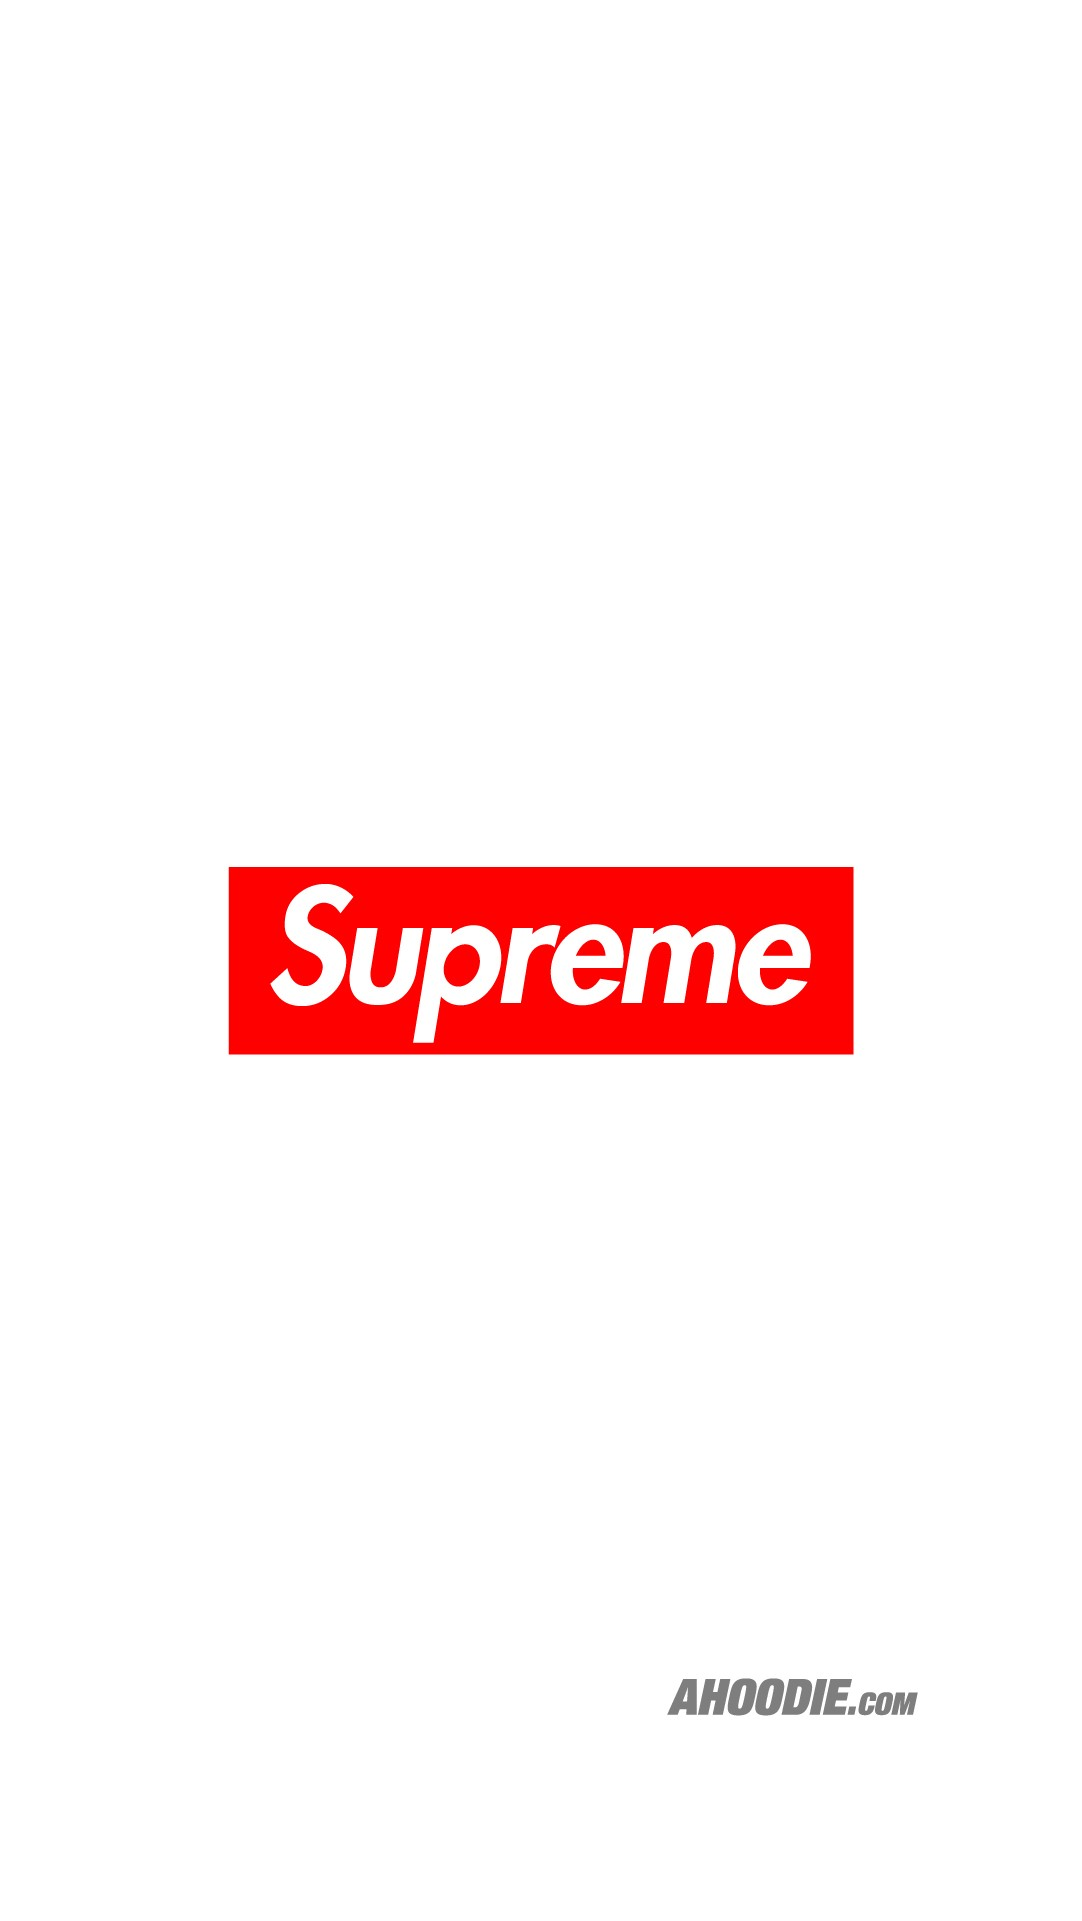 Ahoodie | Supreme Classic Box Logo Wallpaper